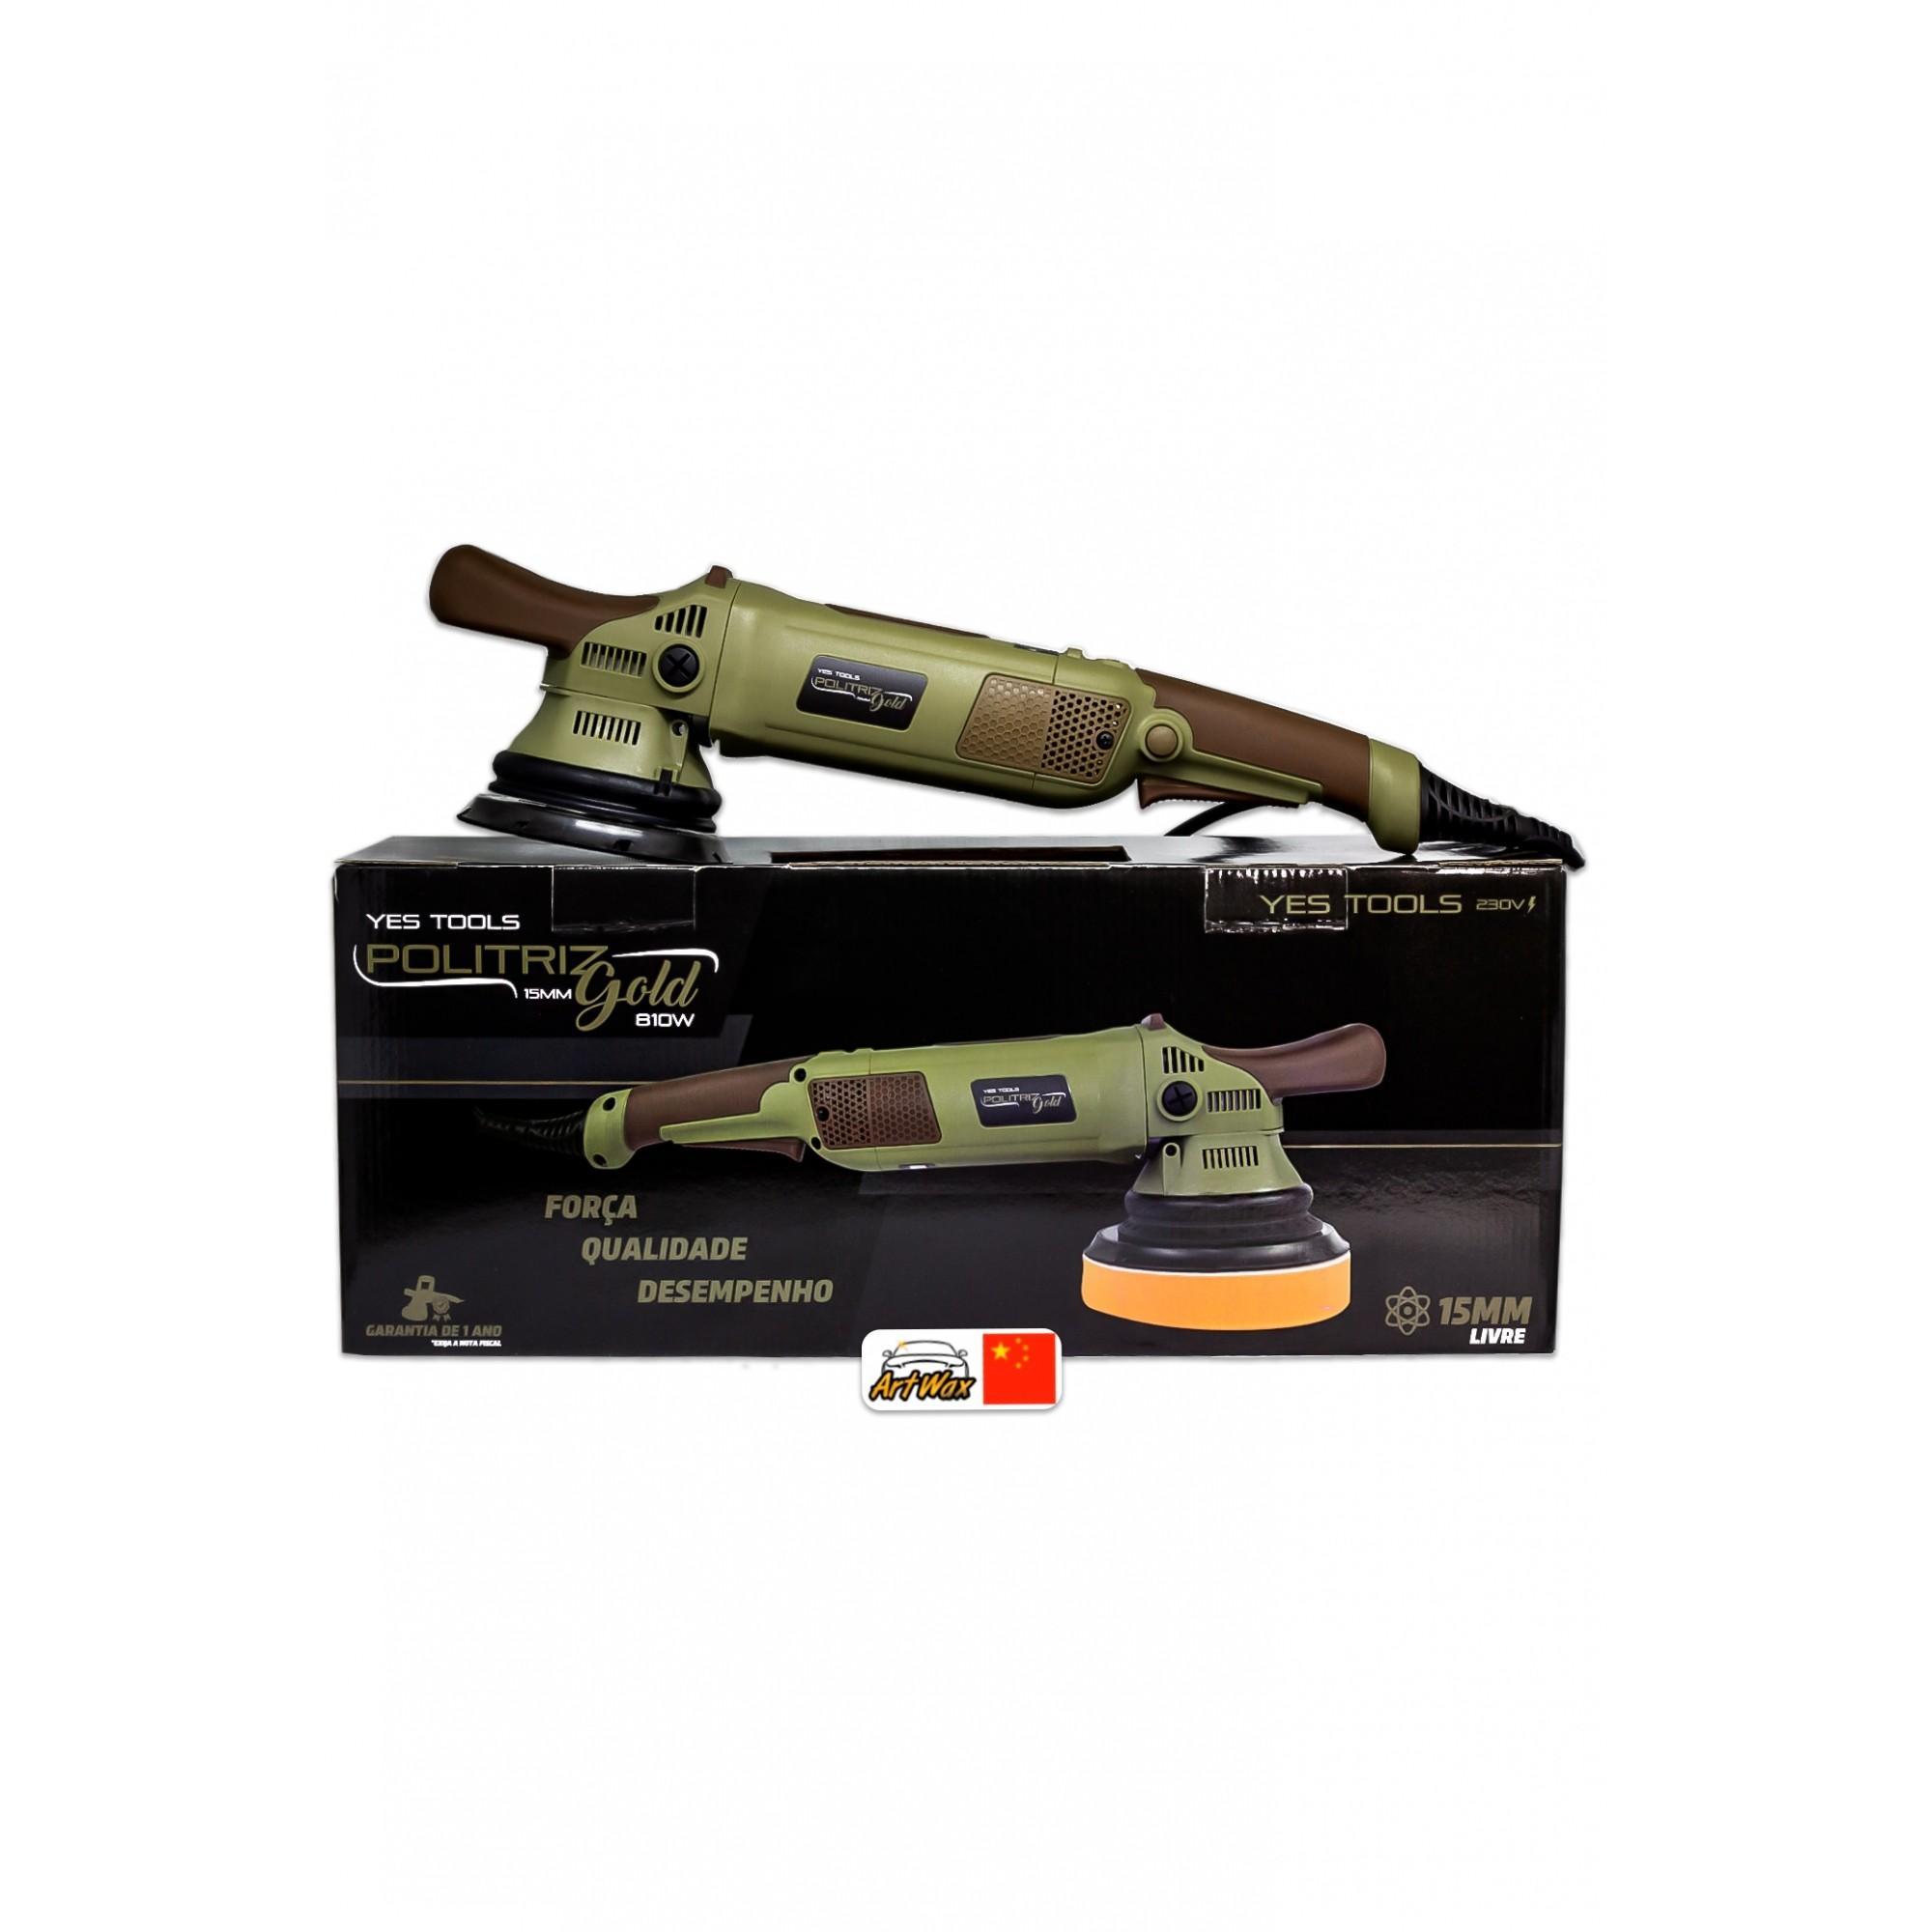 Kers Yes Tools Politriz Roto Orbital livre Gold 15mm 60Hz 810W 230v